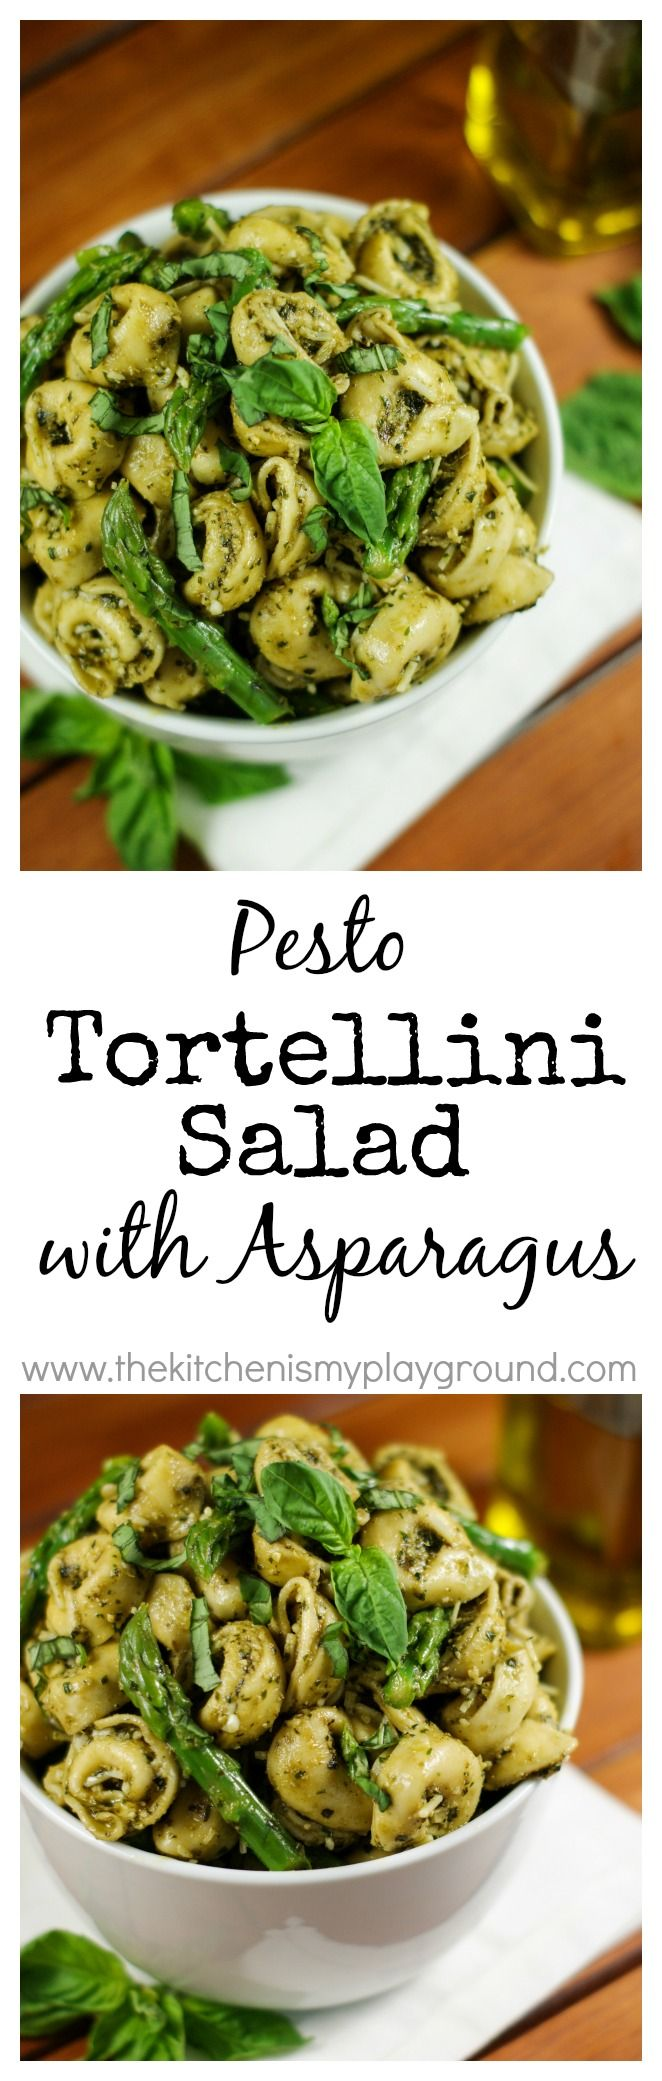 Pesto Tortellini Salad with Asparagus ~ a perfect Springtime pasta salad. www.thekitchenismyplayground.com